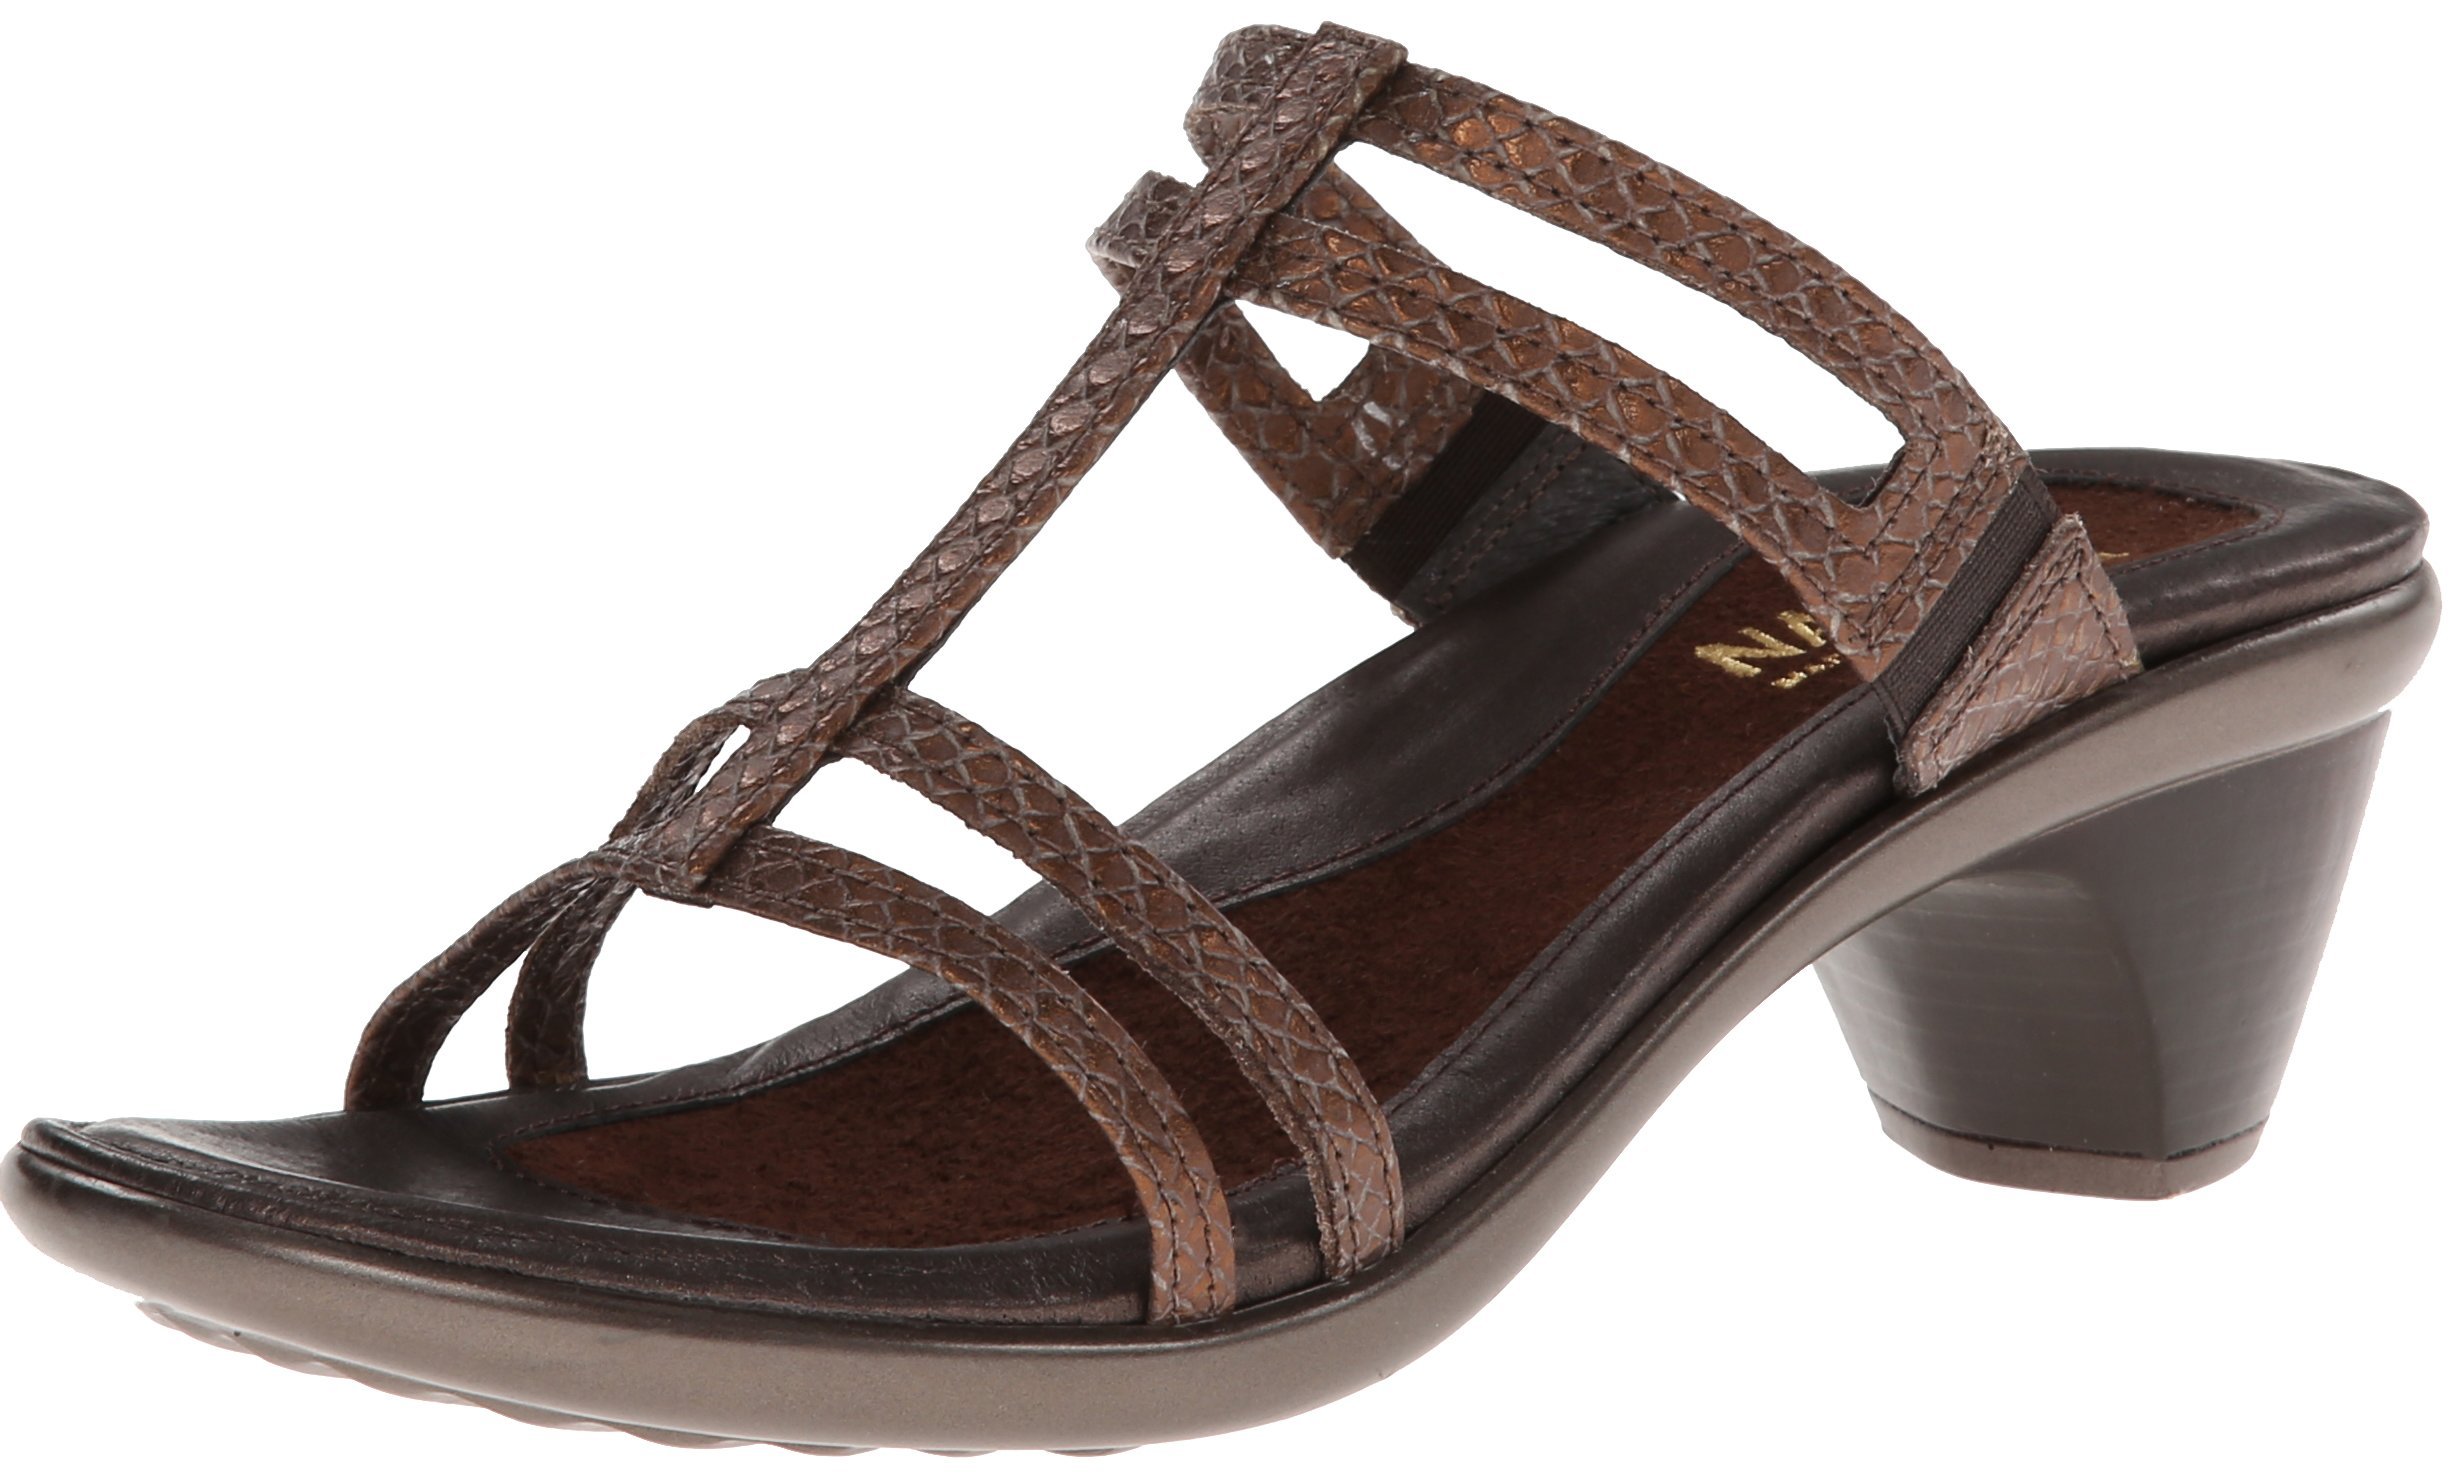 Naot Women's Loop Dress Sandal,Brown Lizard Leather,35 EU/4 M US